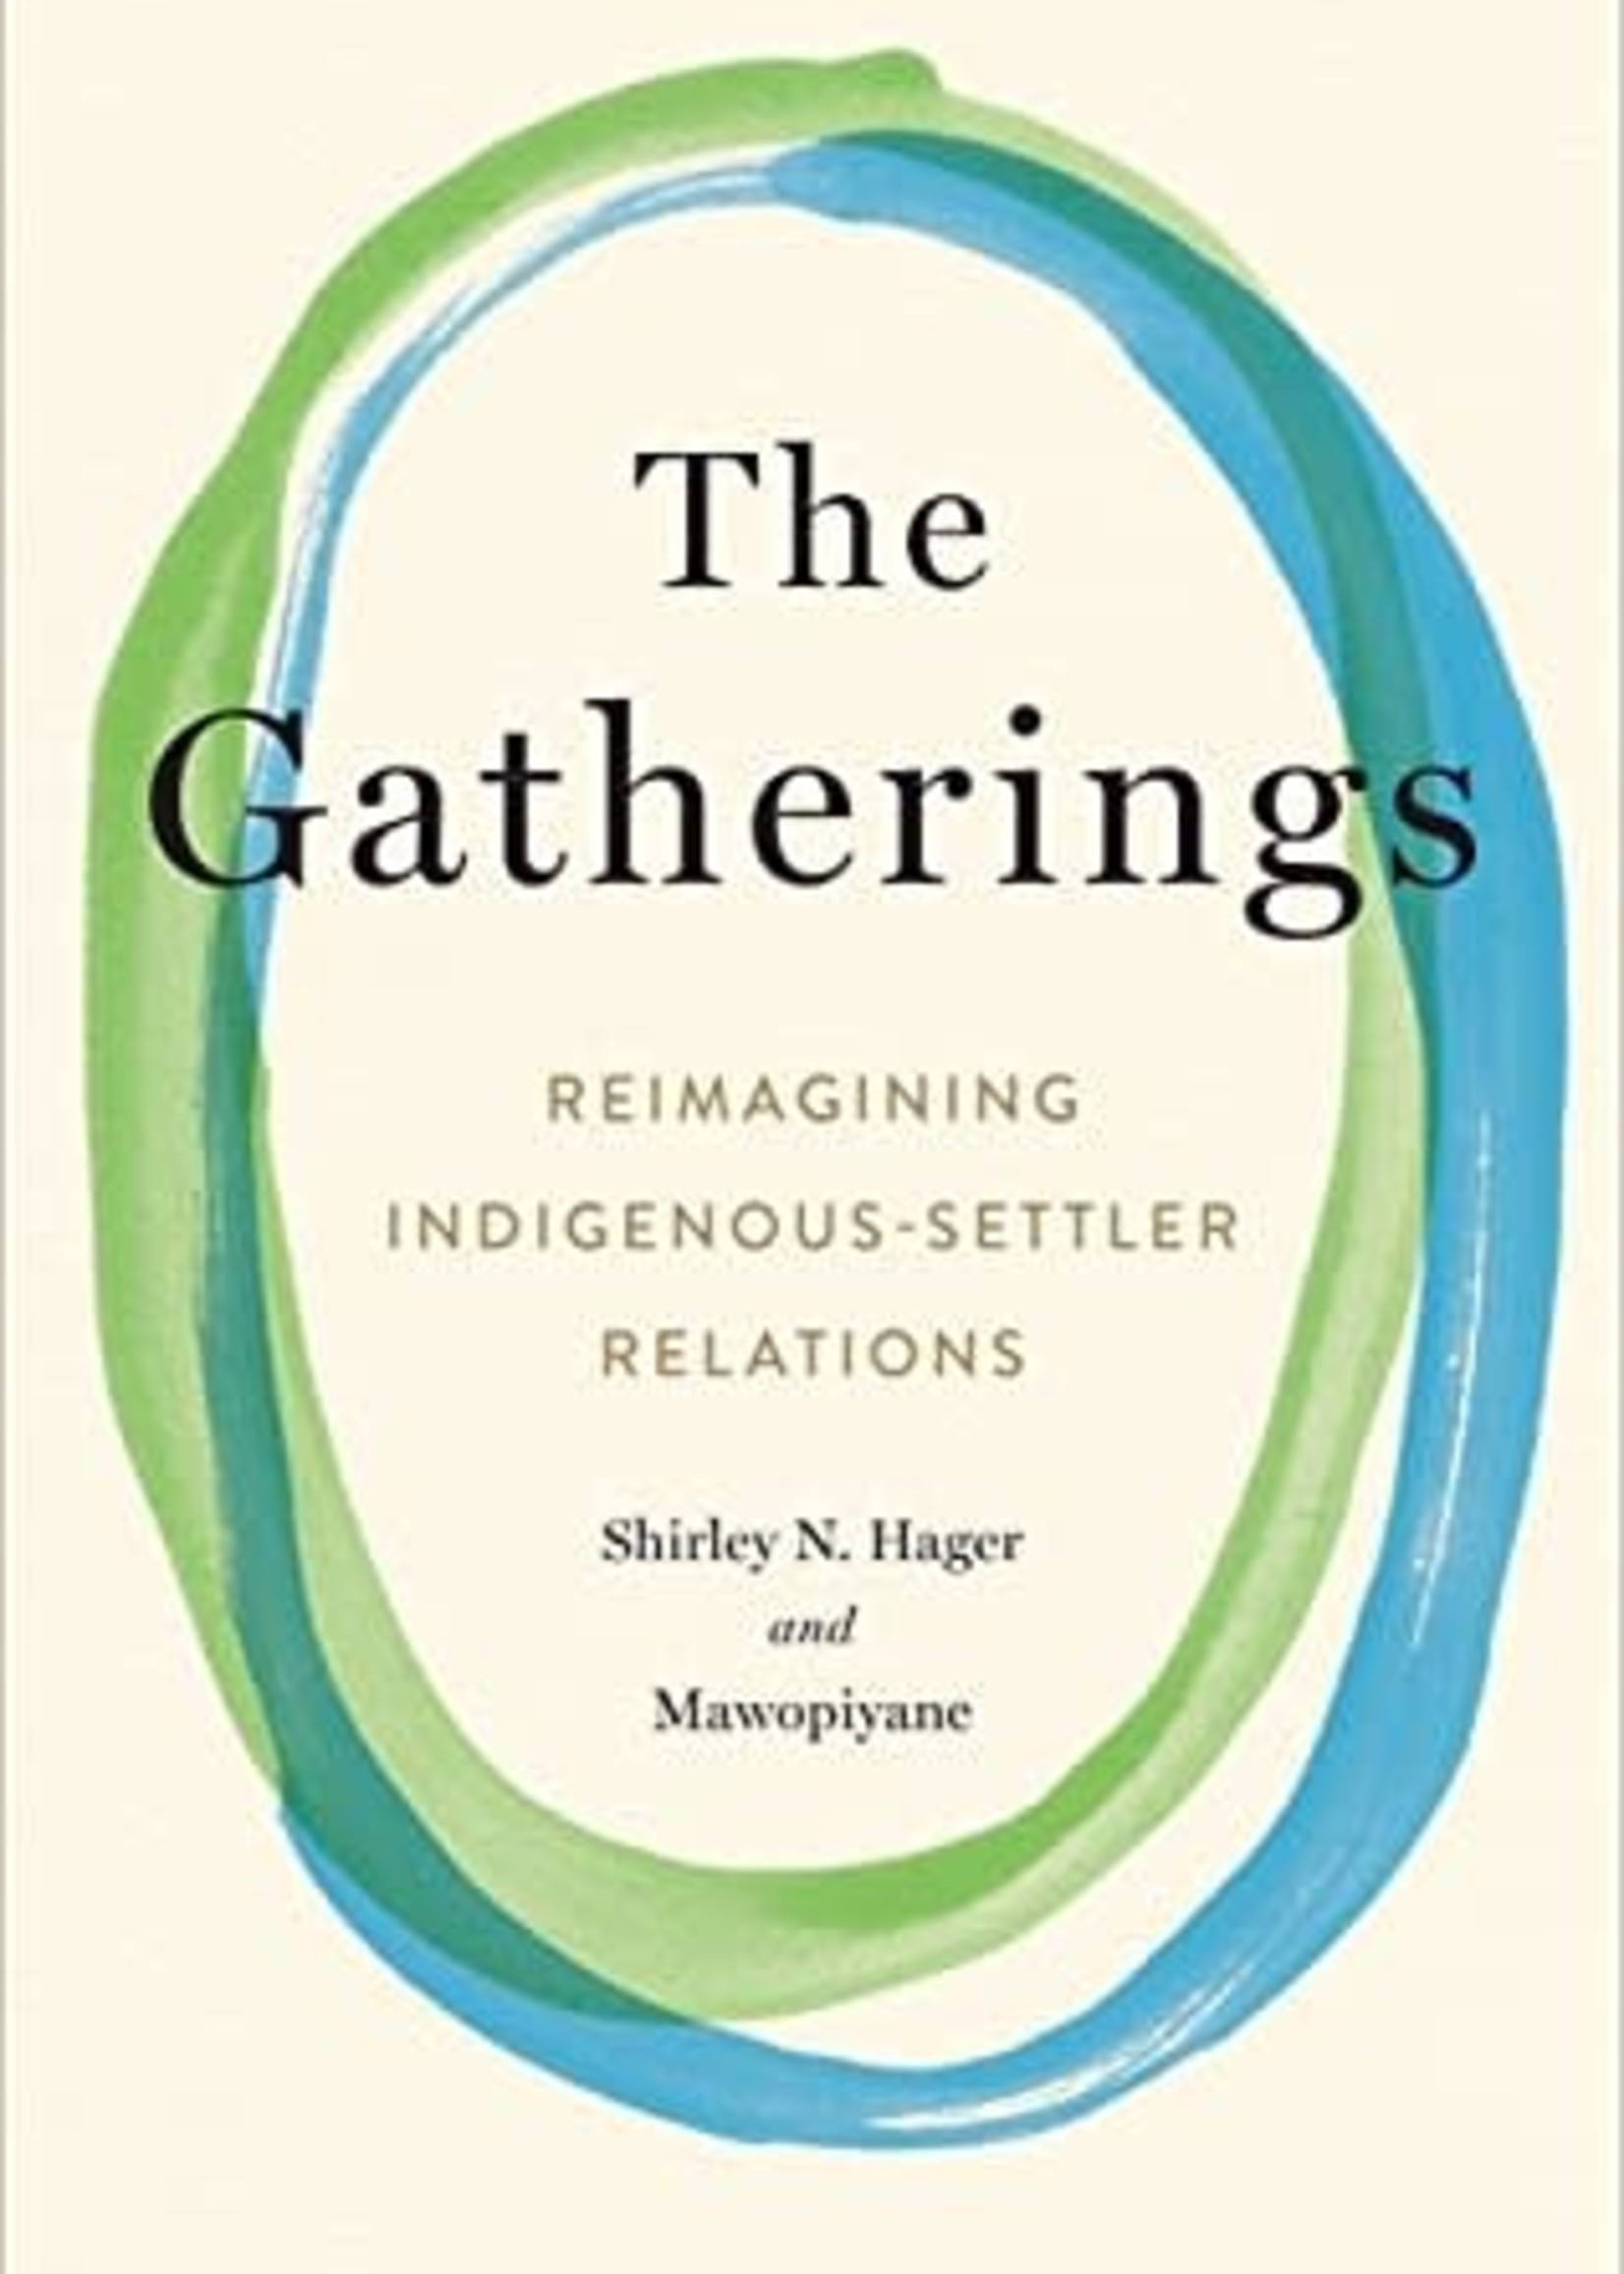 The Gatherings: Reimagining Indigenous-Settler Relations by Shirley Hager,  Mawopiyane